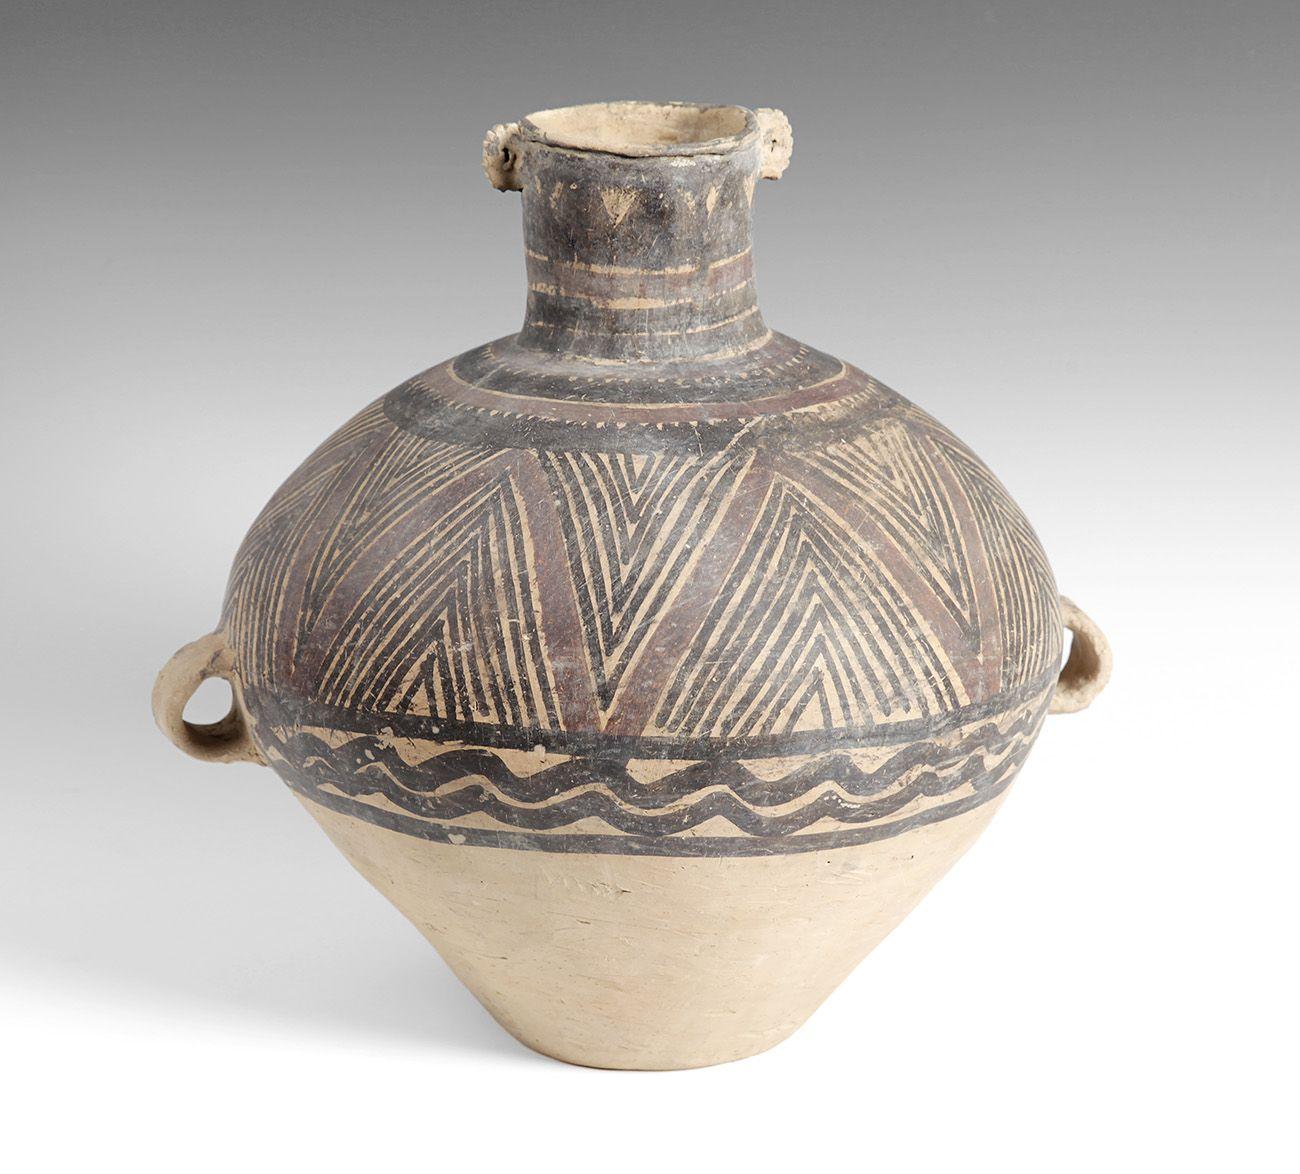 Vasija de la cultura yangshao china periodo neoltico hacia el vasija de la cultura yangshao china periodo neoltico hacia el culturehistory reviewsmspy